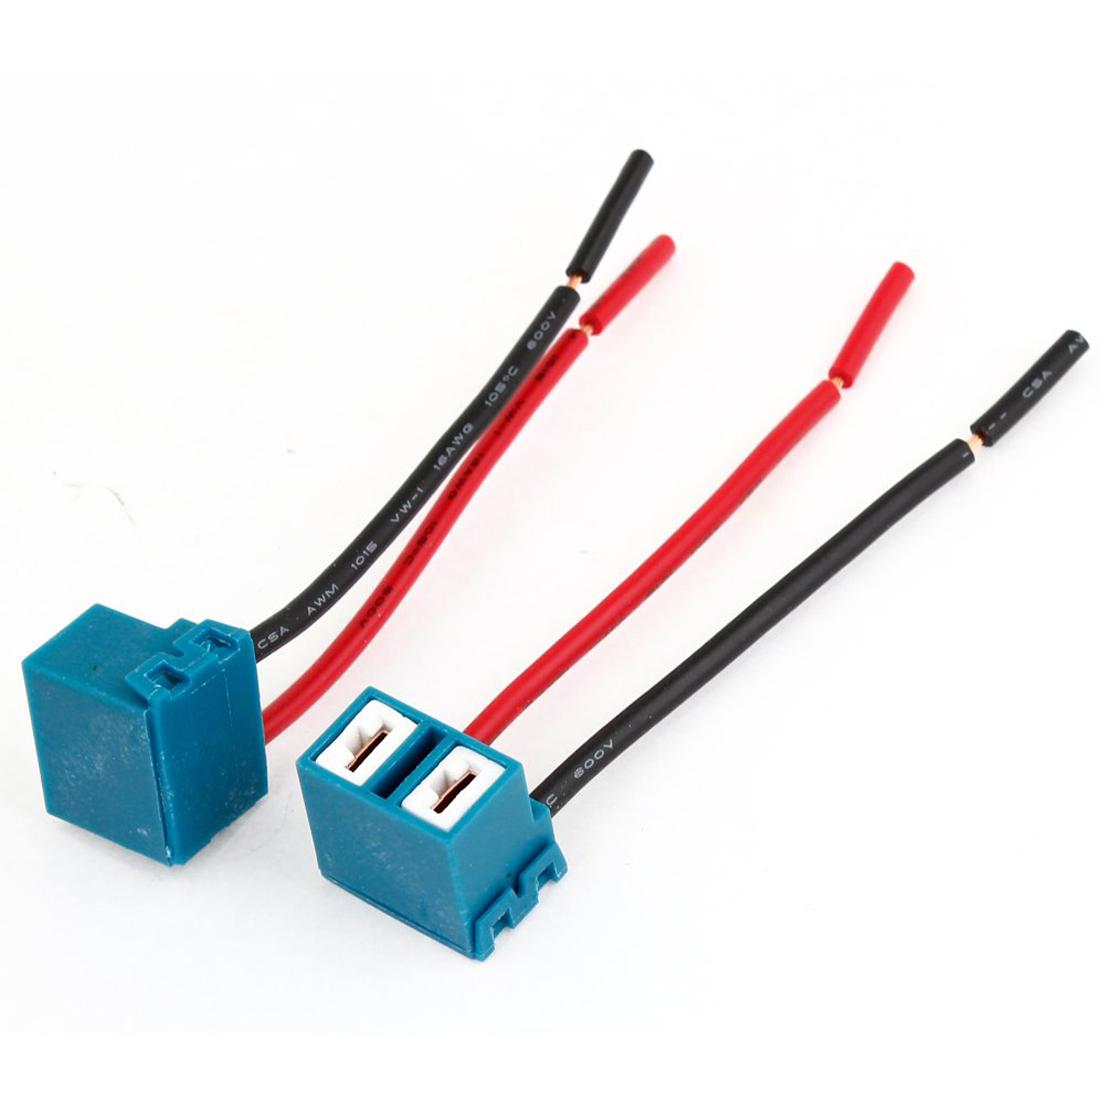 H7 Headlight Bulb Socket : H ceramic headlight light bulb wire plug socket for